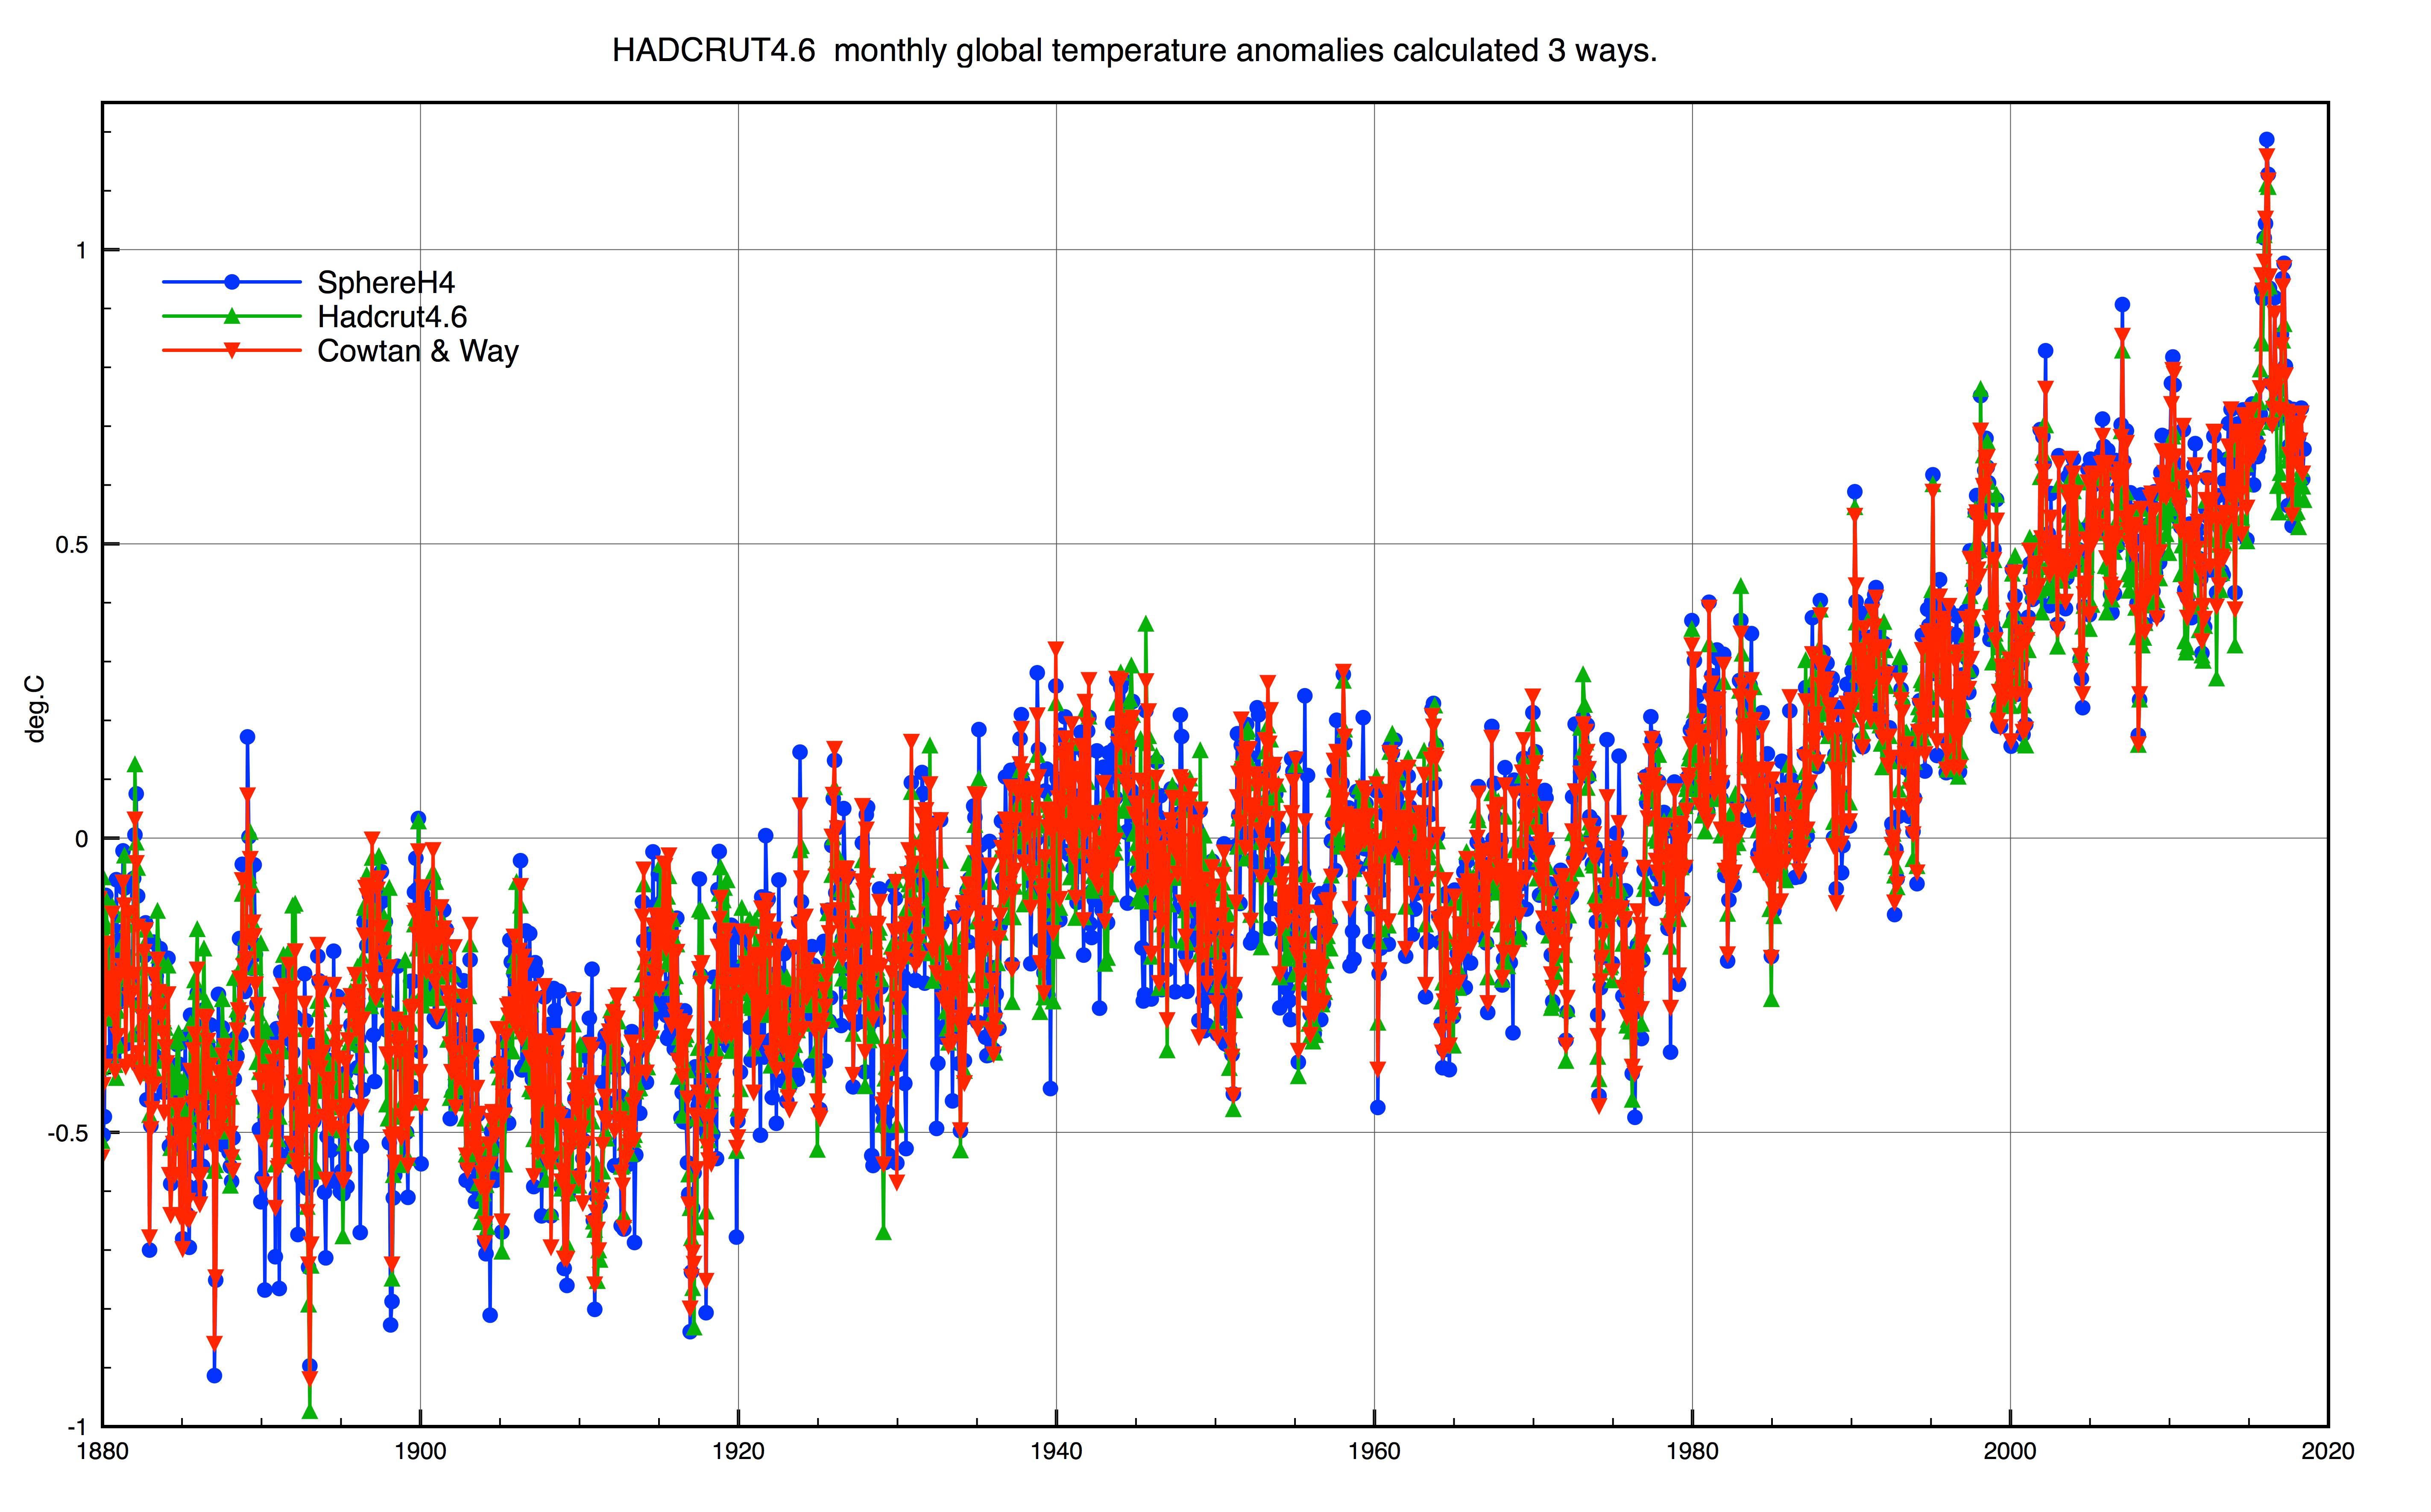 https://i0.wp.com/clivebest.com/blog/wp-content/uploads/2018/07/June-graph1.png